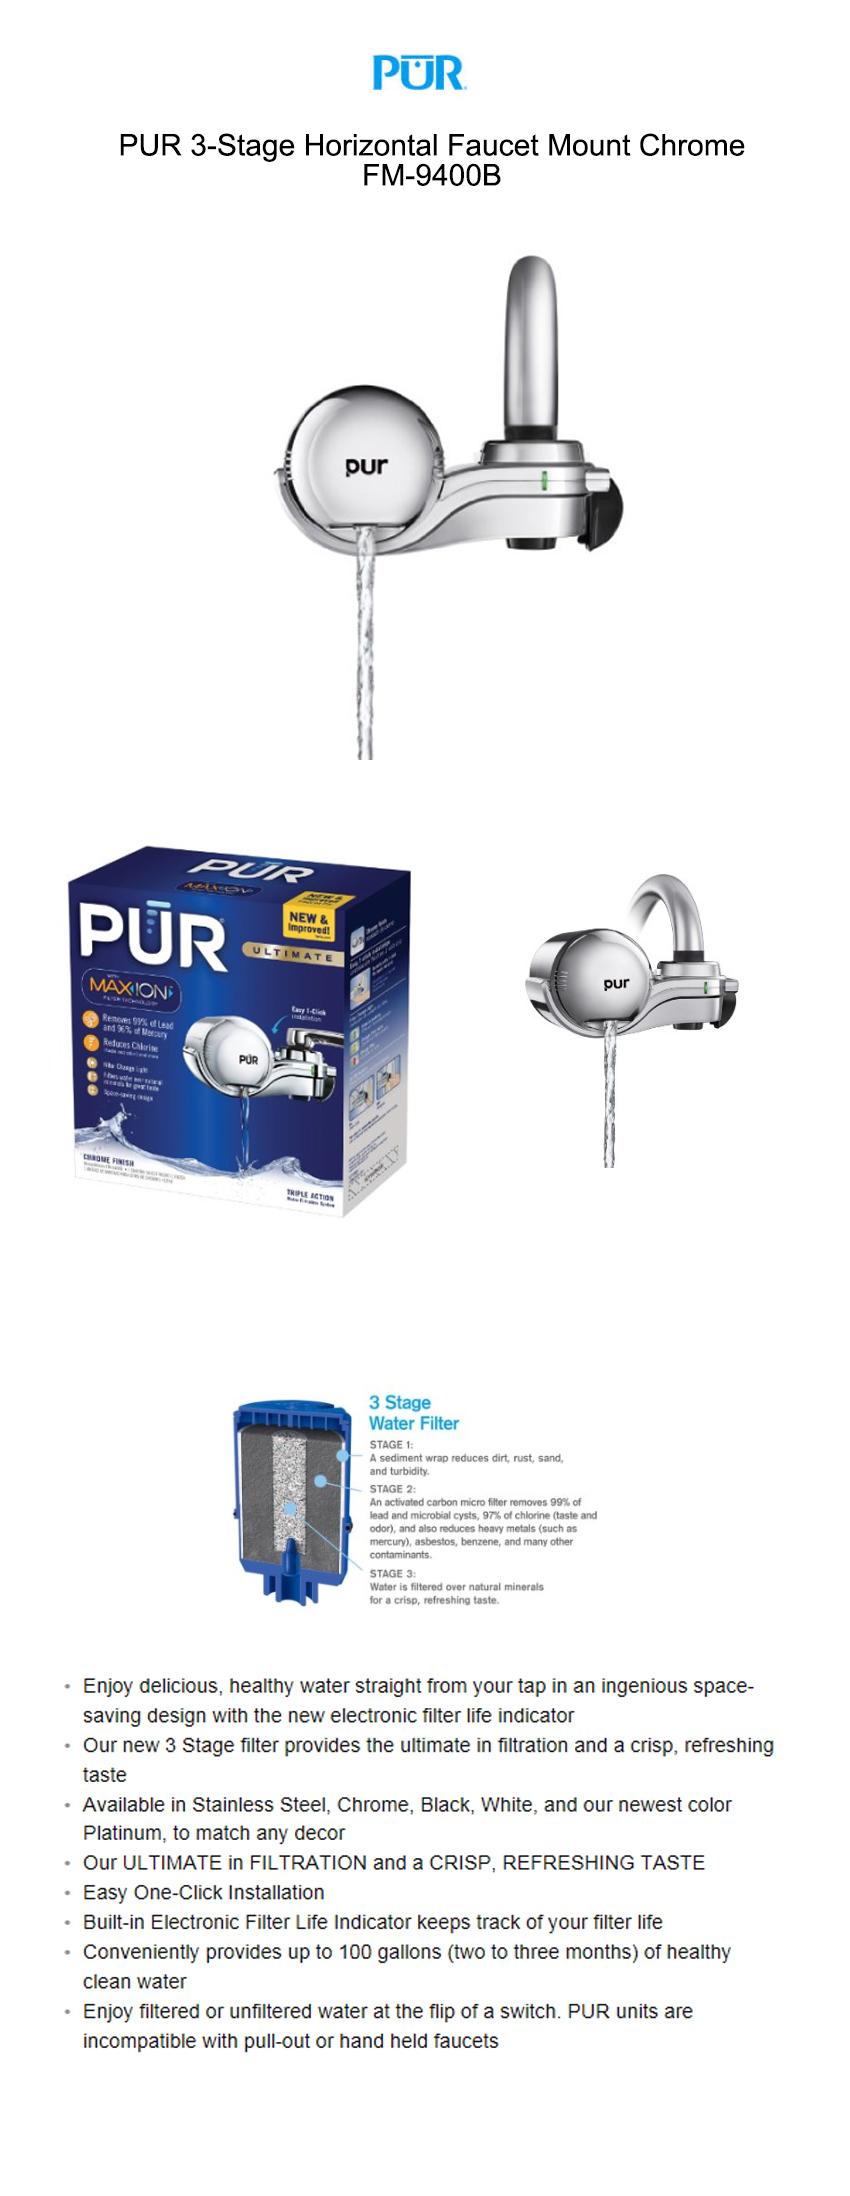 G마켓 - 정수기PUR 3Stage Horizontal Faucet Mount FM-9400B